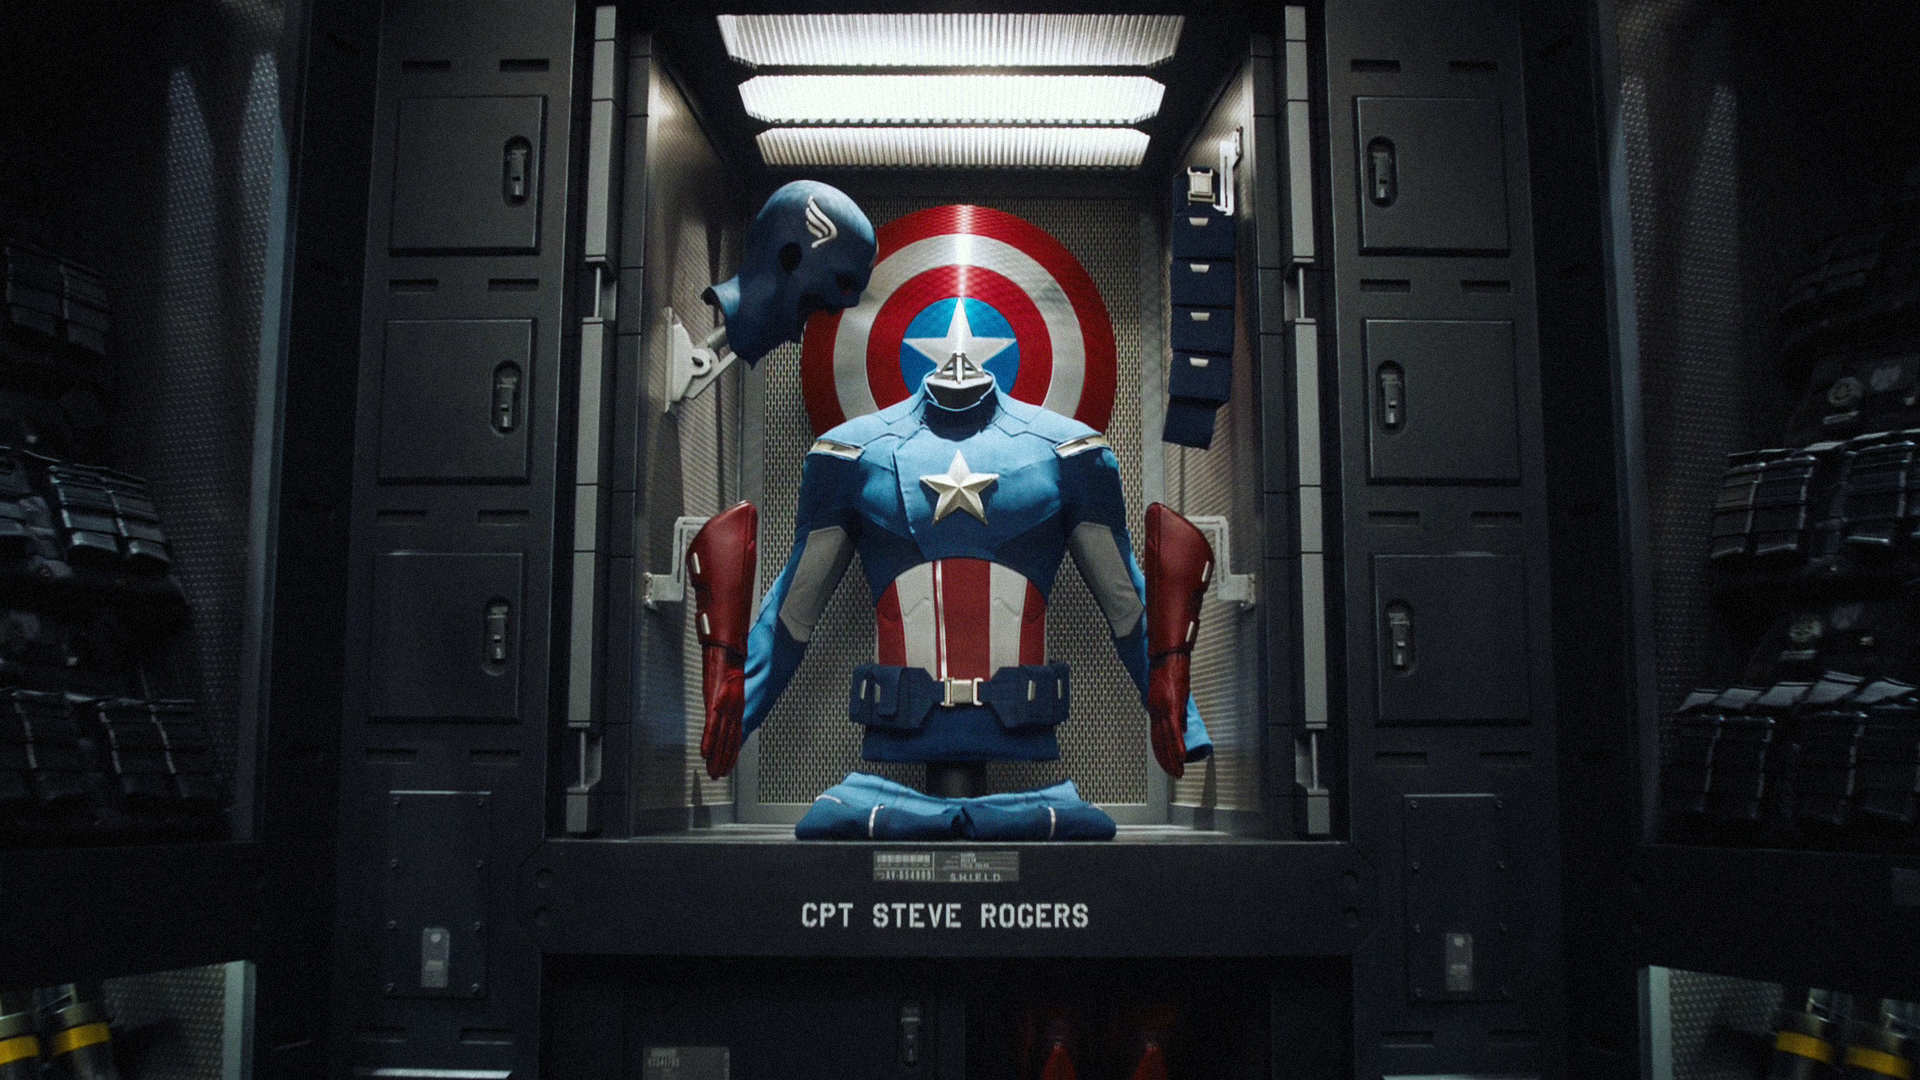 1920x1080 Captain America Costume desktop PC and Mac wallpaper 1920x1080